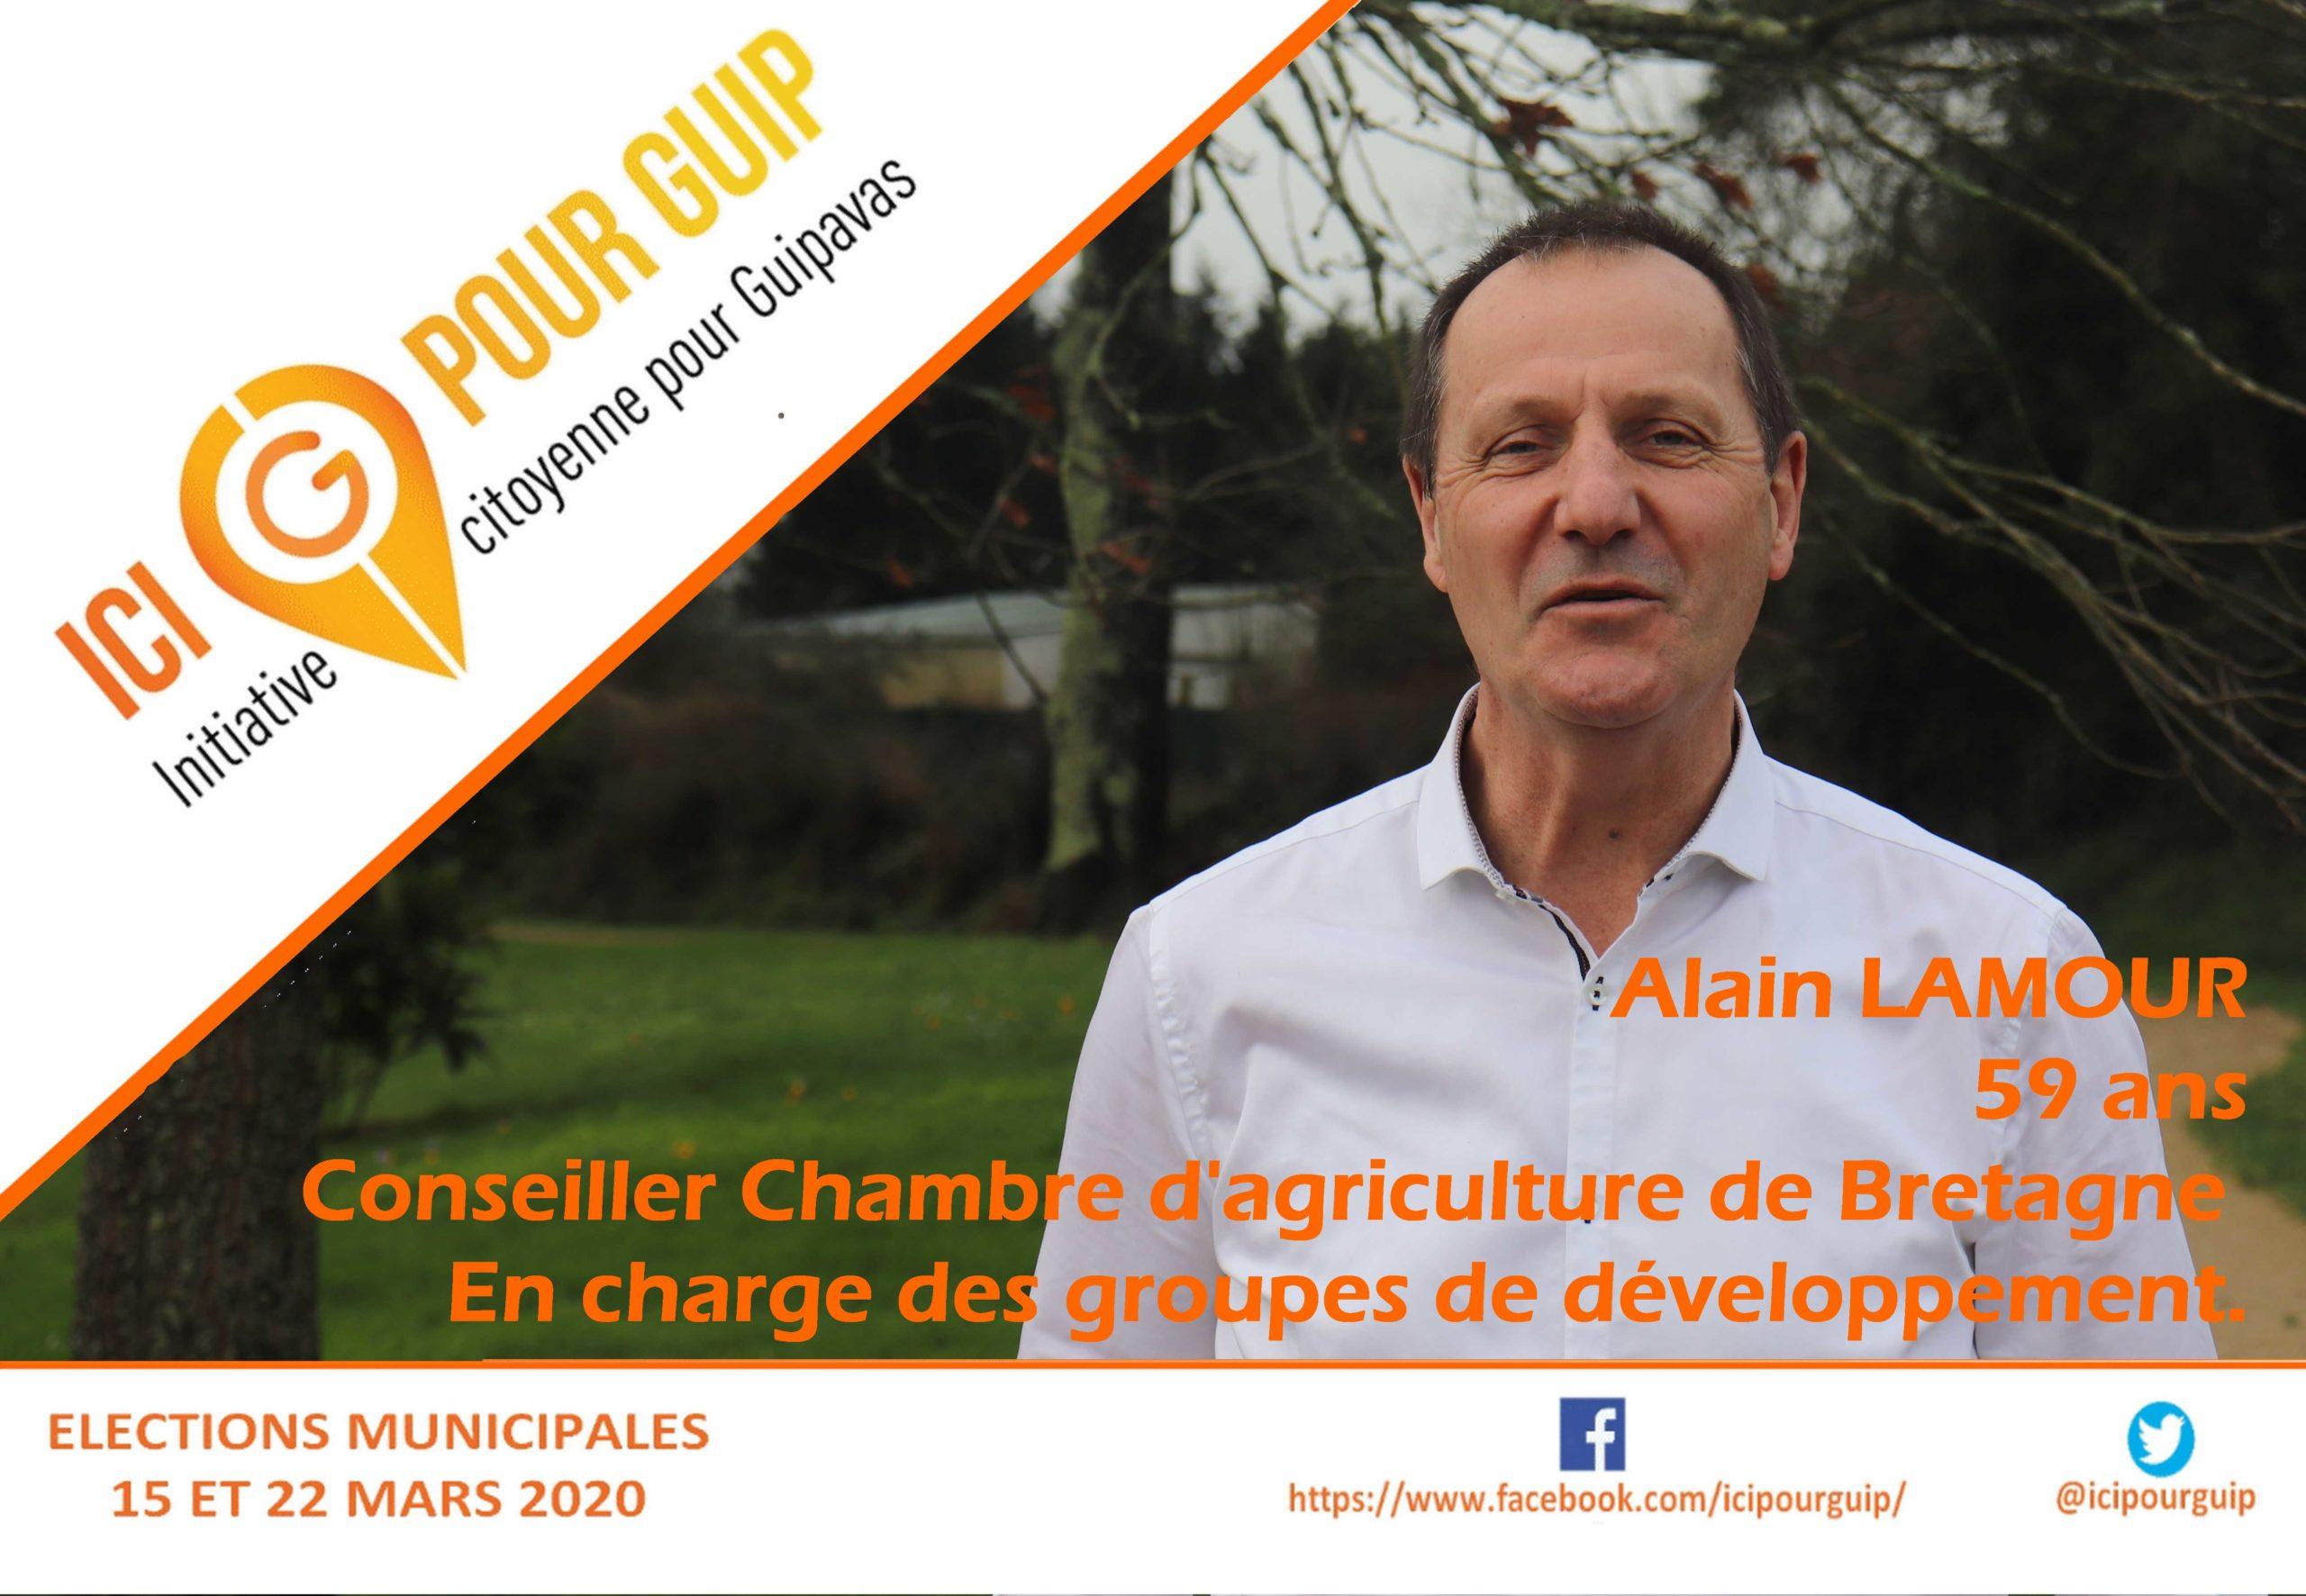 Alain Lamour